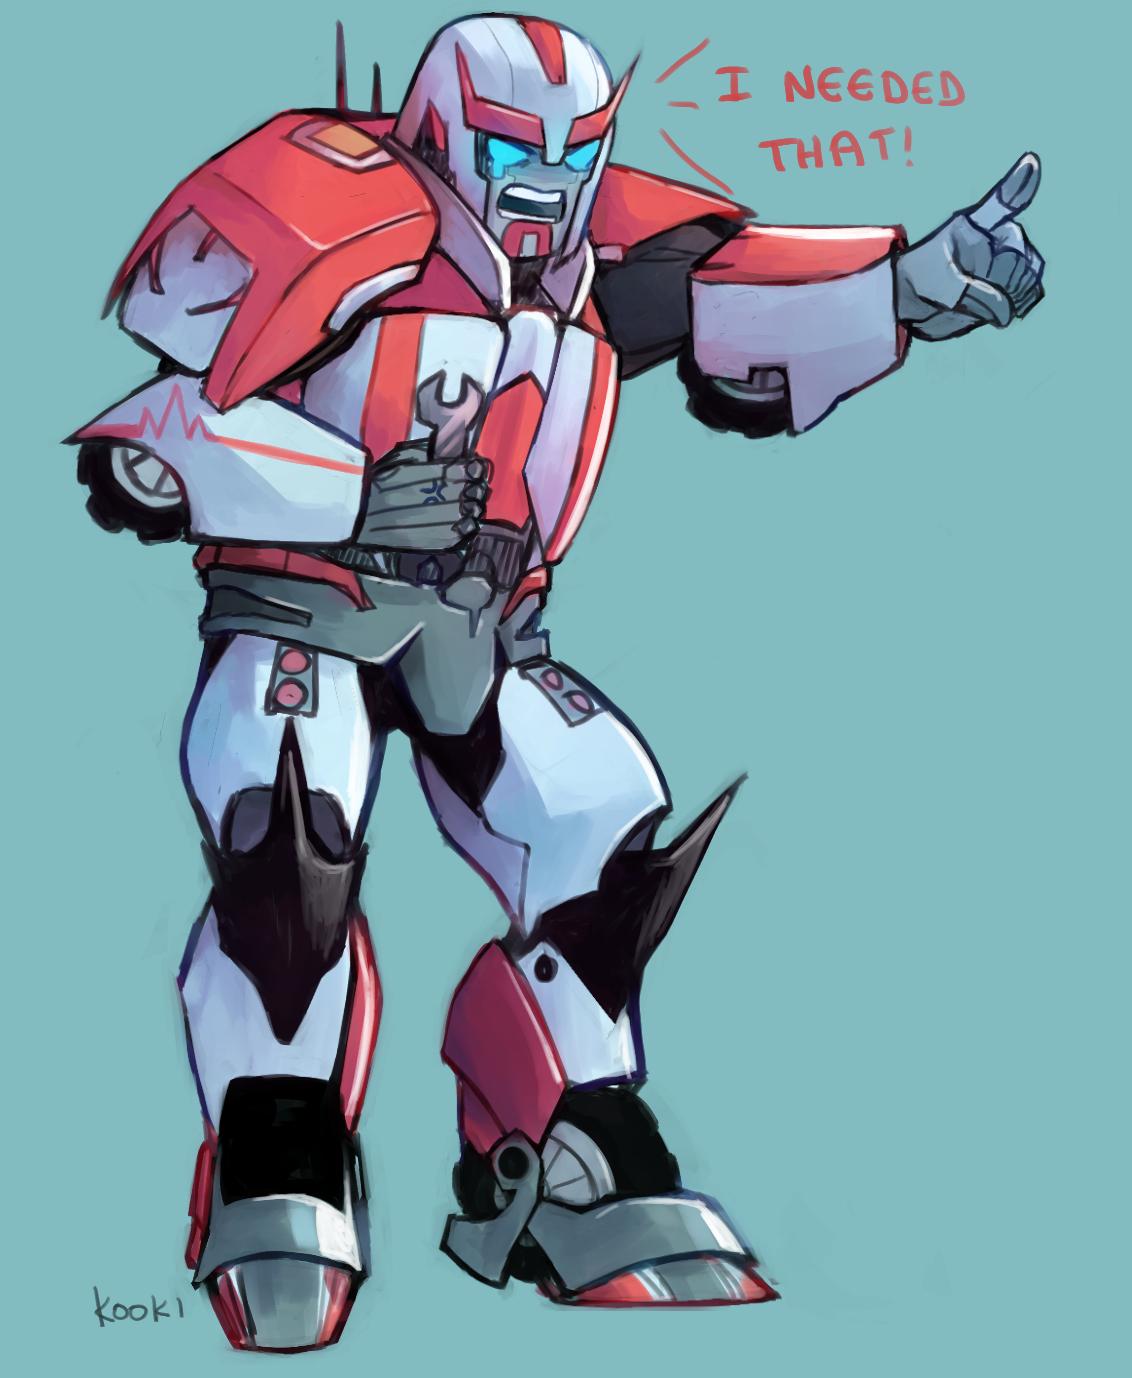 transformers prime | Tumblr | CUTE! | Transformers prime